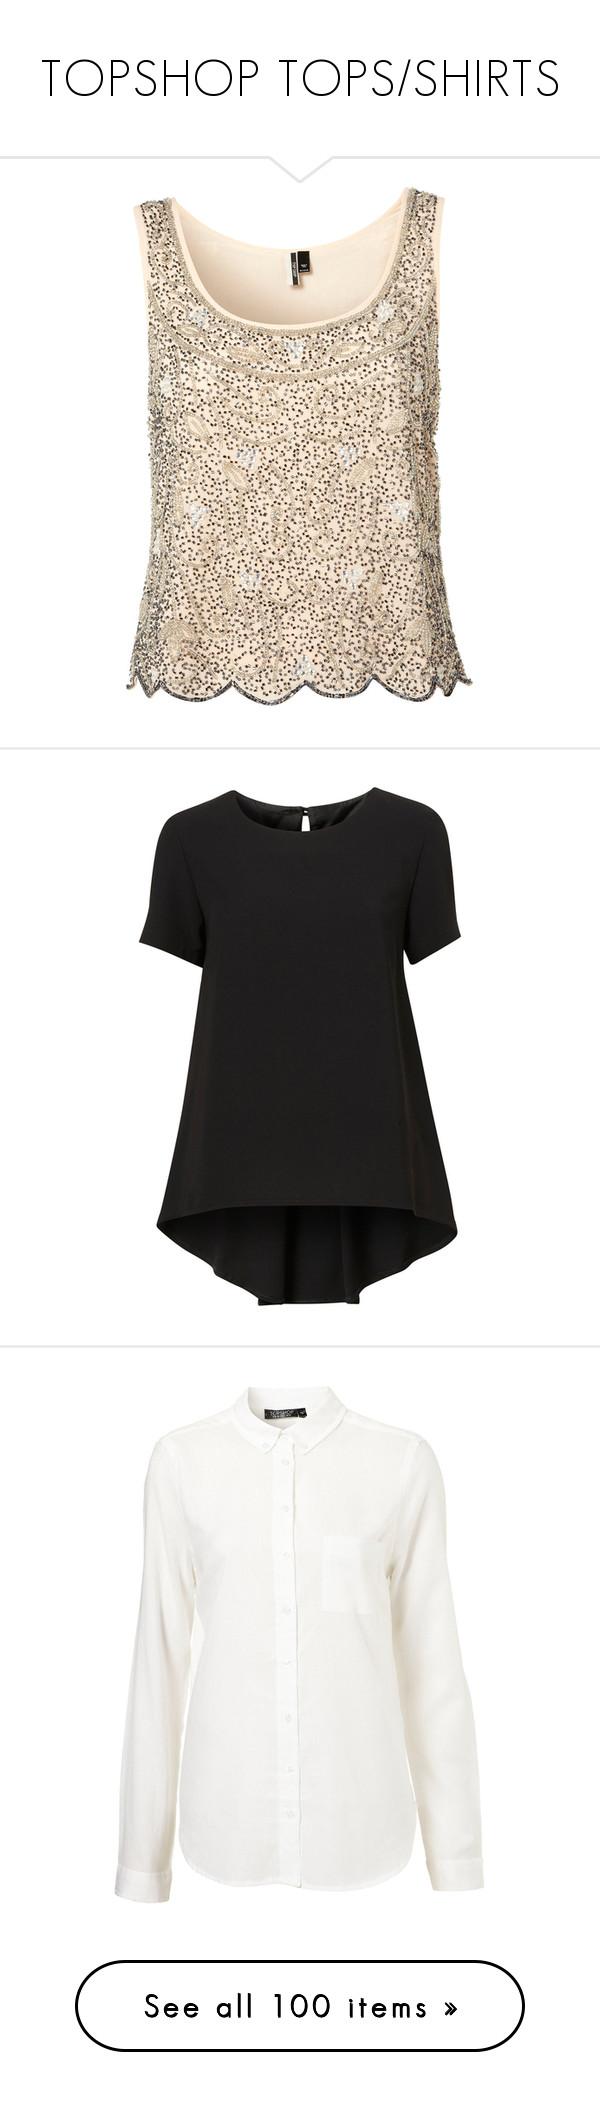 8fadf37c40 Topshop Shirts Polyvore - BCD Tofu House